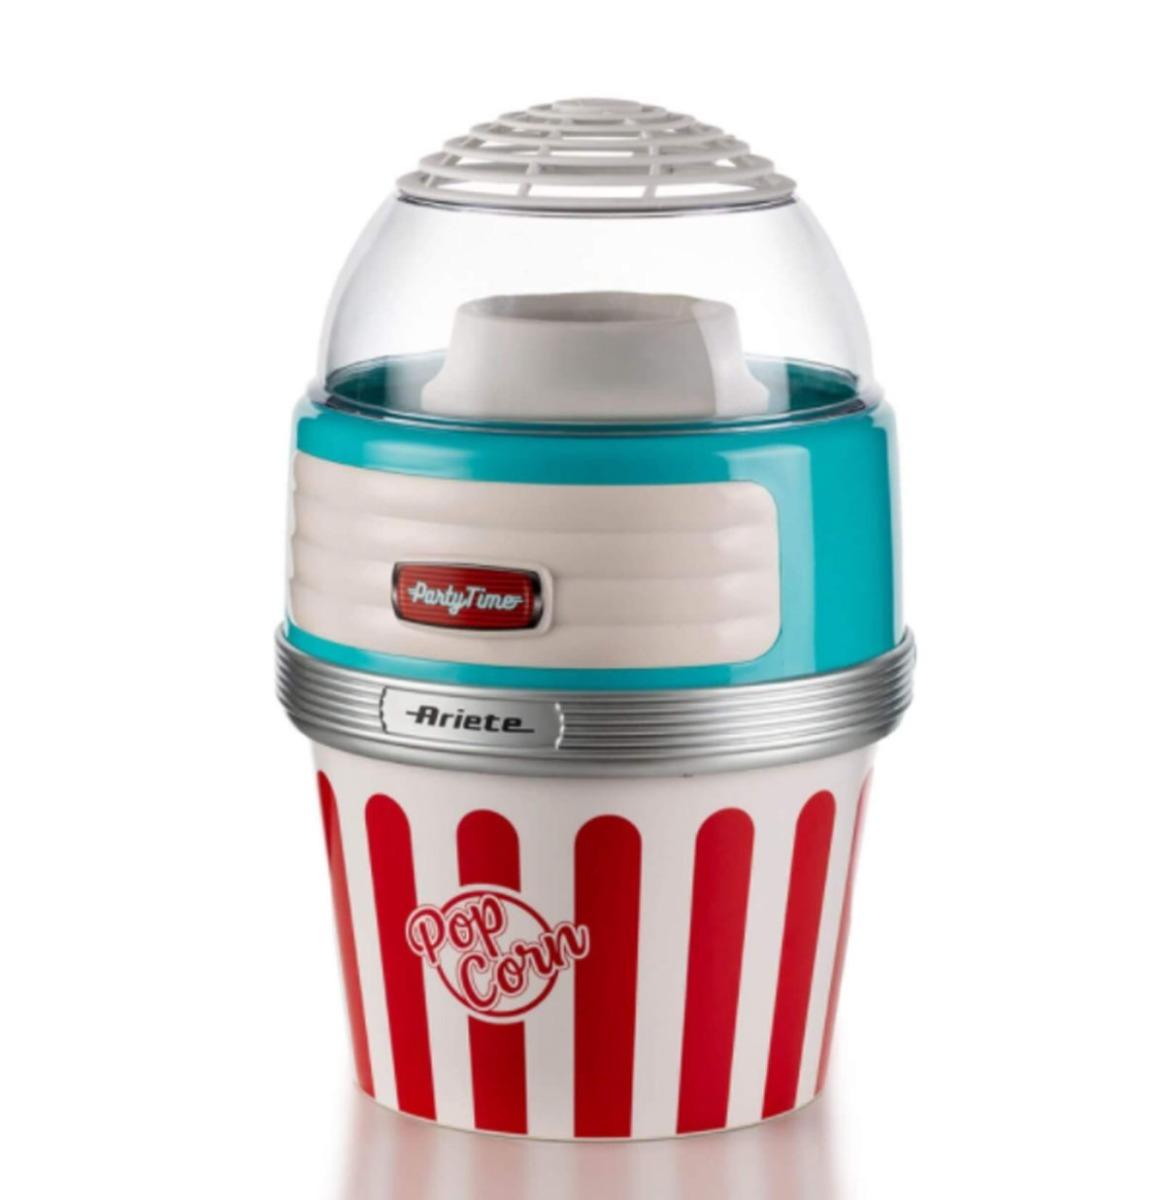 Ariete Partytime Retro Popcorn Popper - Blauw